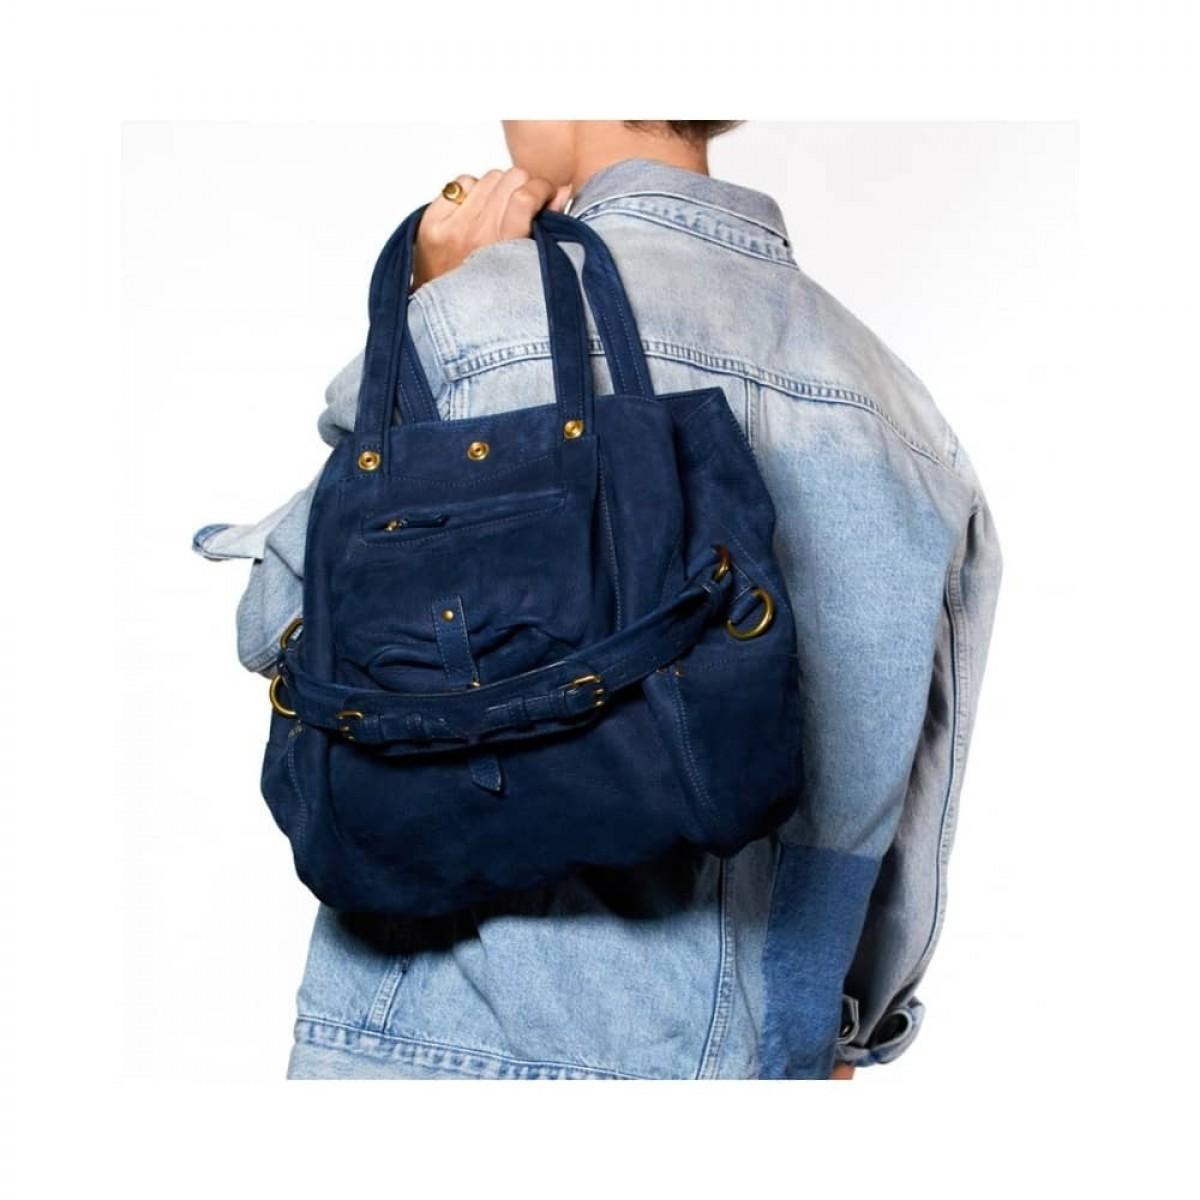 billy m taske - marine - model bag